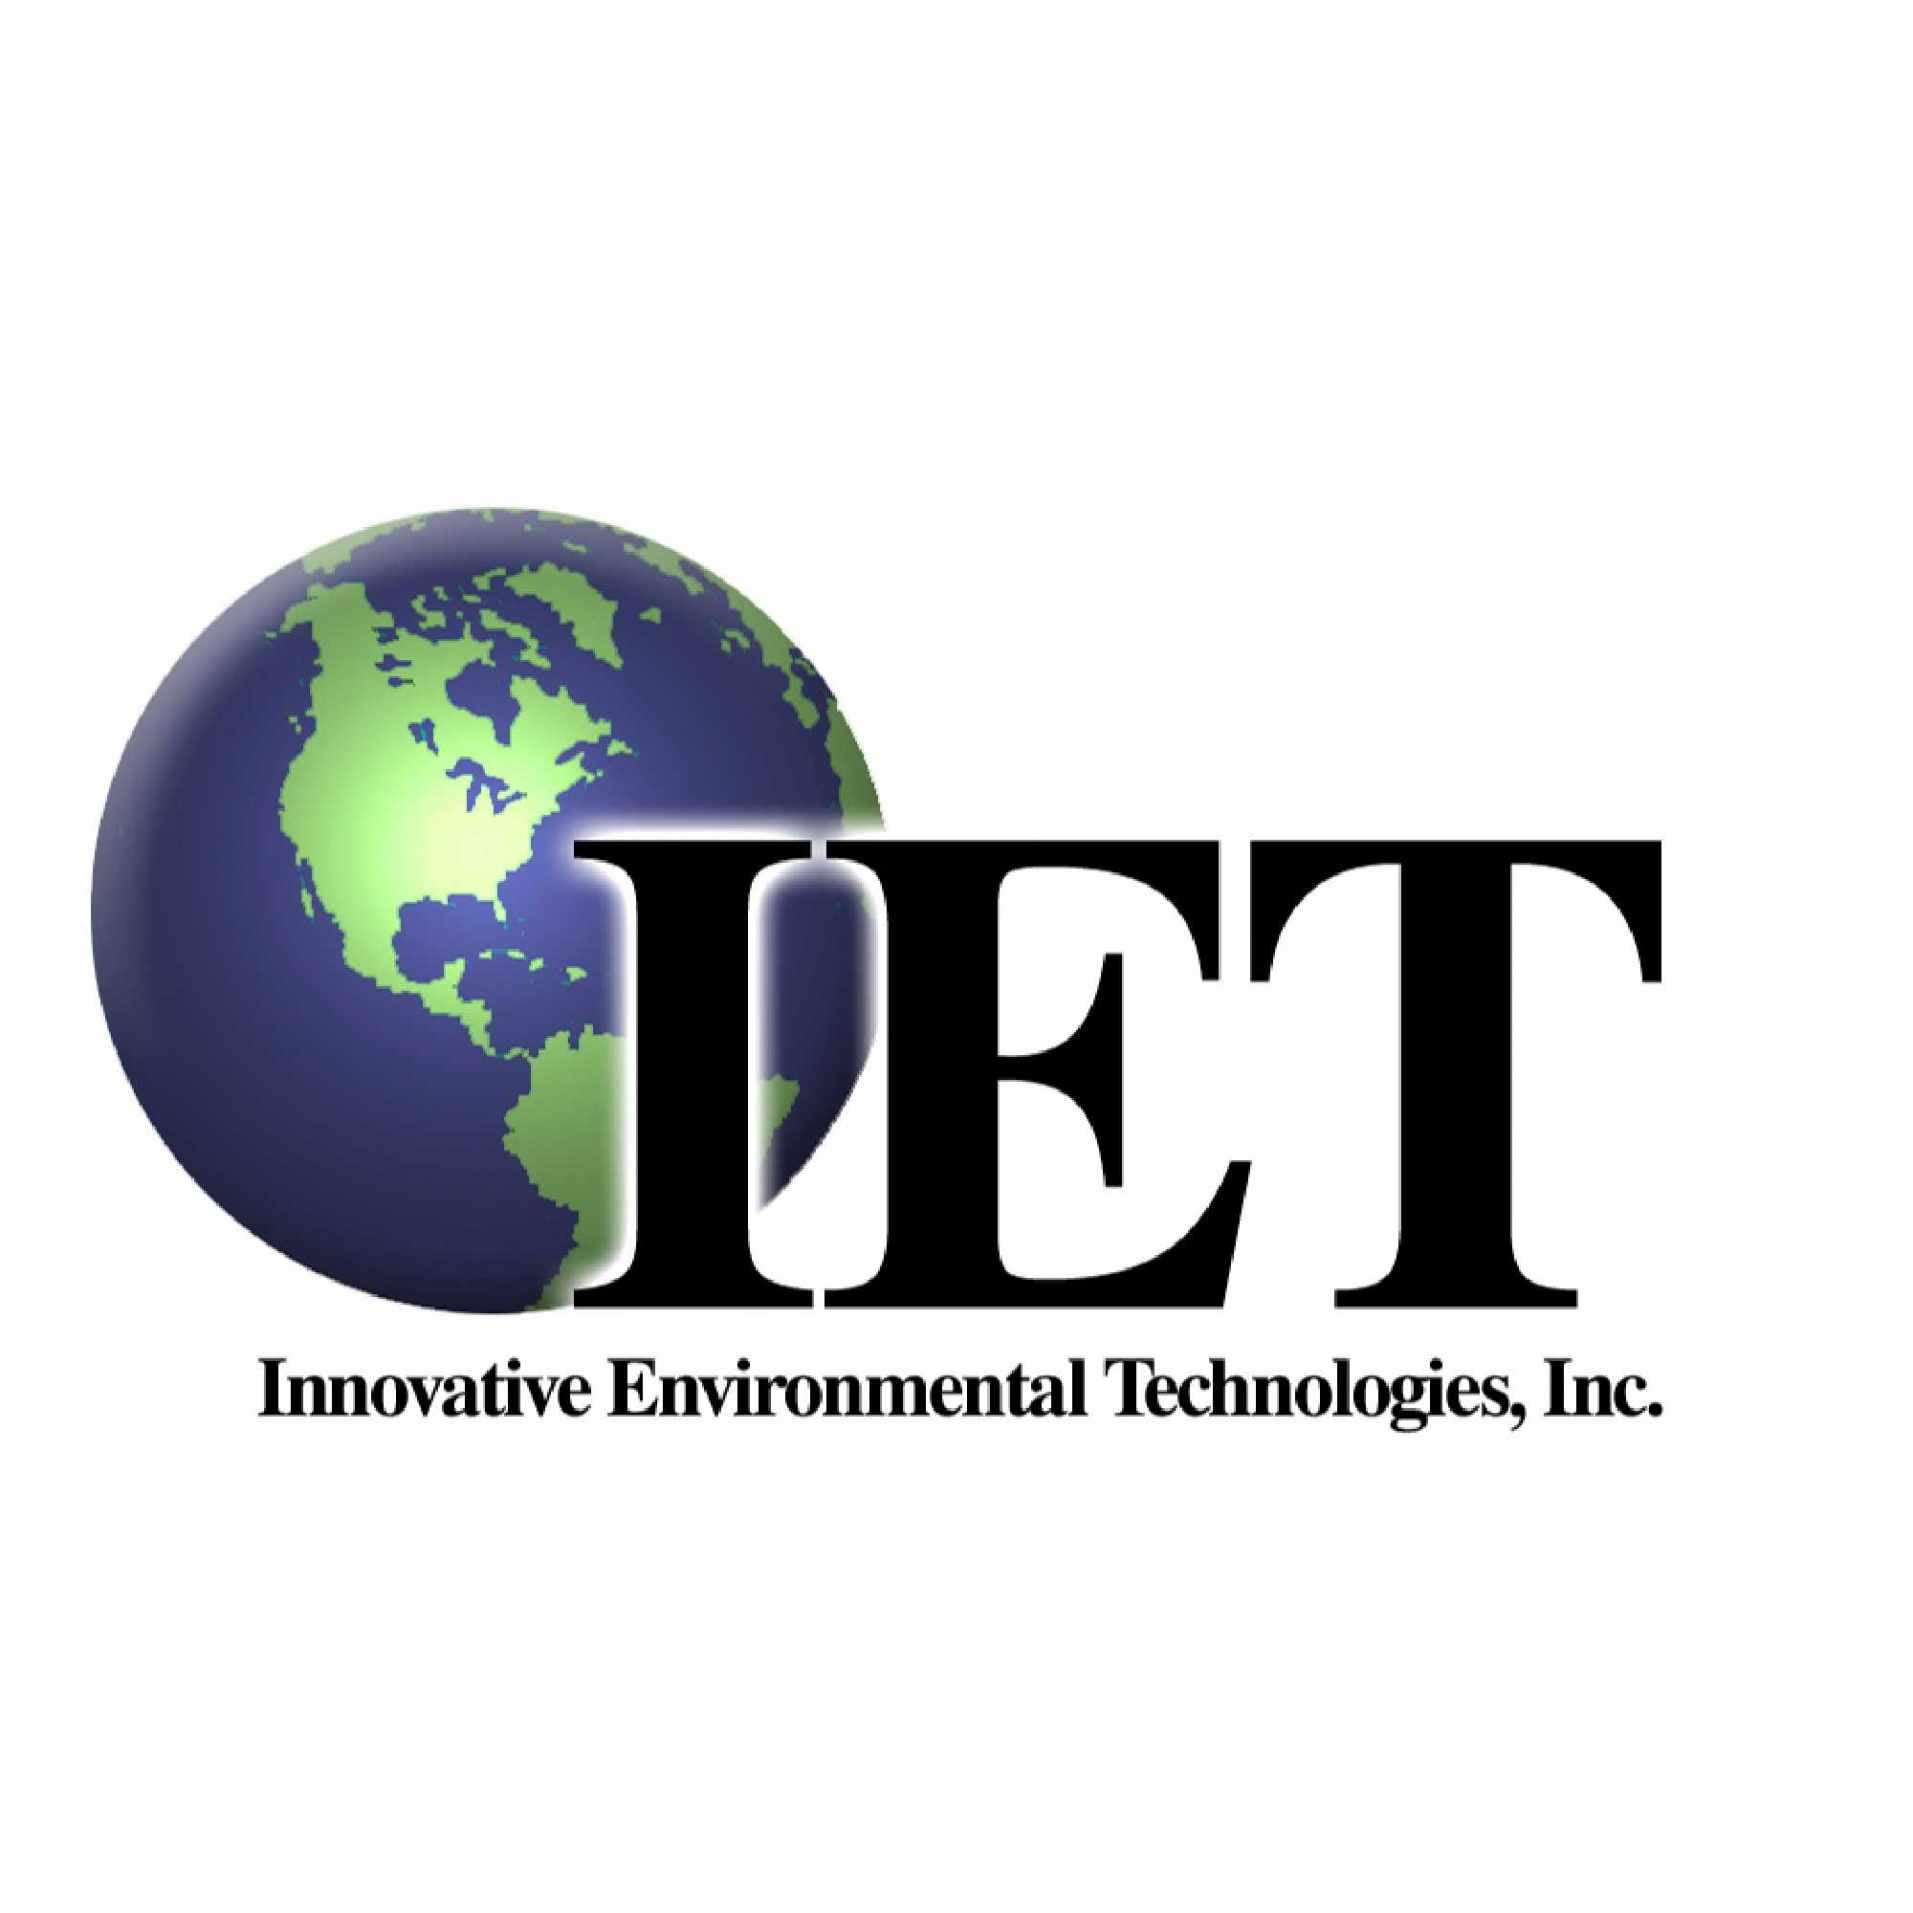 Innovative Environmental Technologies, Inc